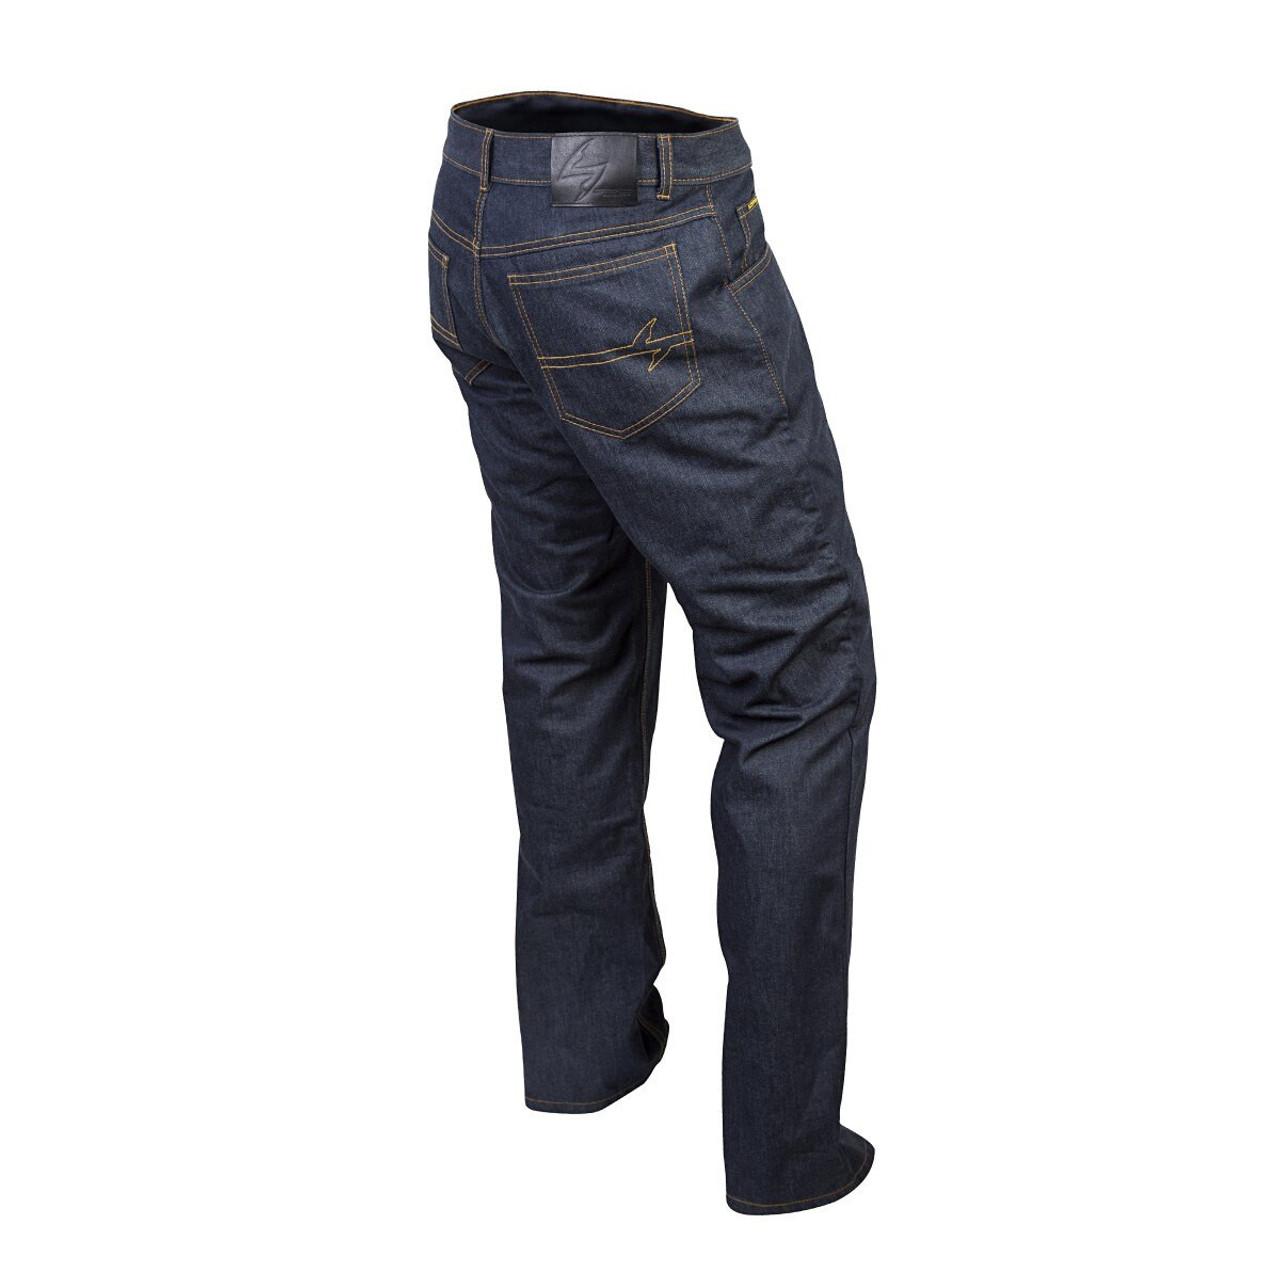 36 Blue Scorpion Men/'s COVERT DUPONT KEVLAR-Lined Denim Riding Jeans